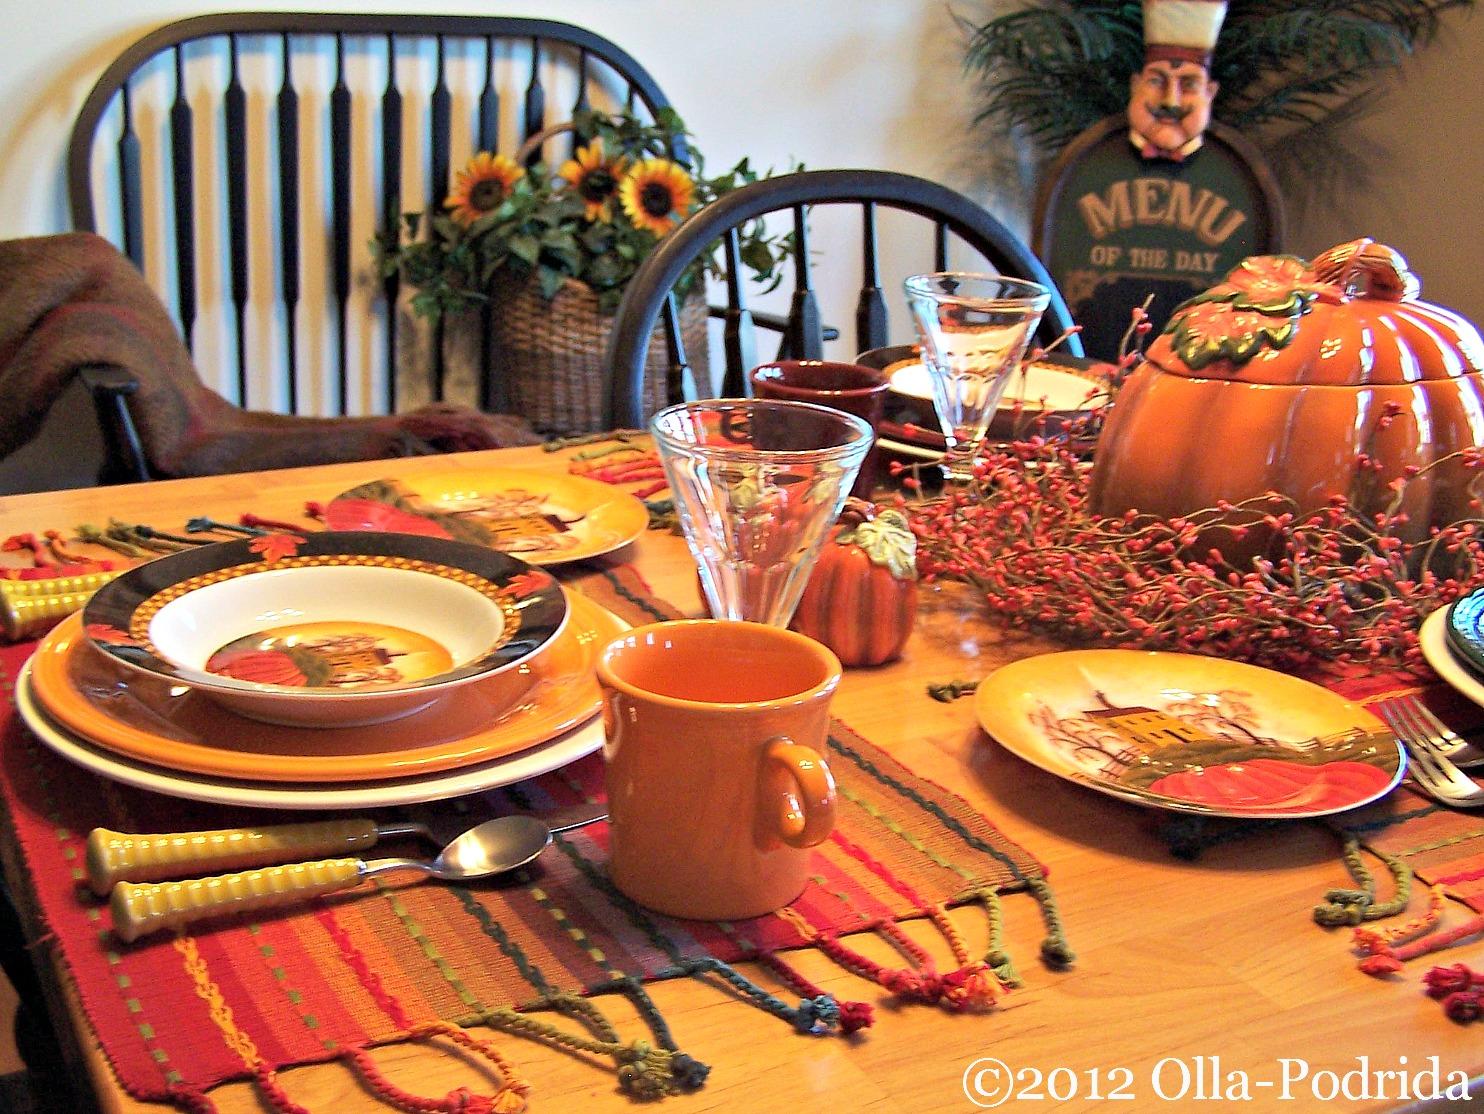 Olla-Podrida: Autumn Harvest Table Setting